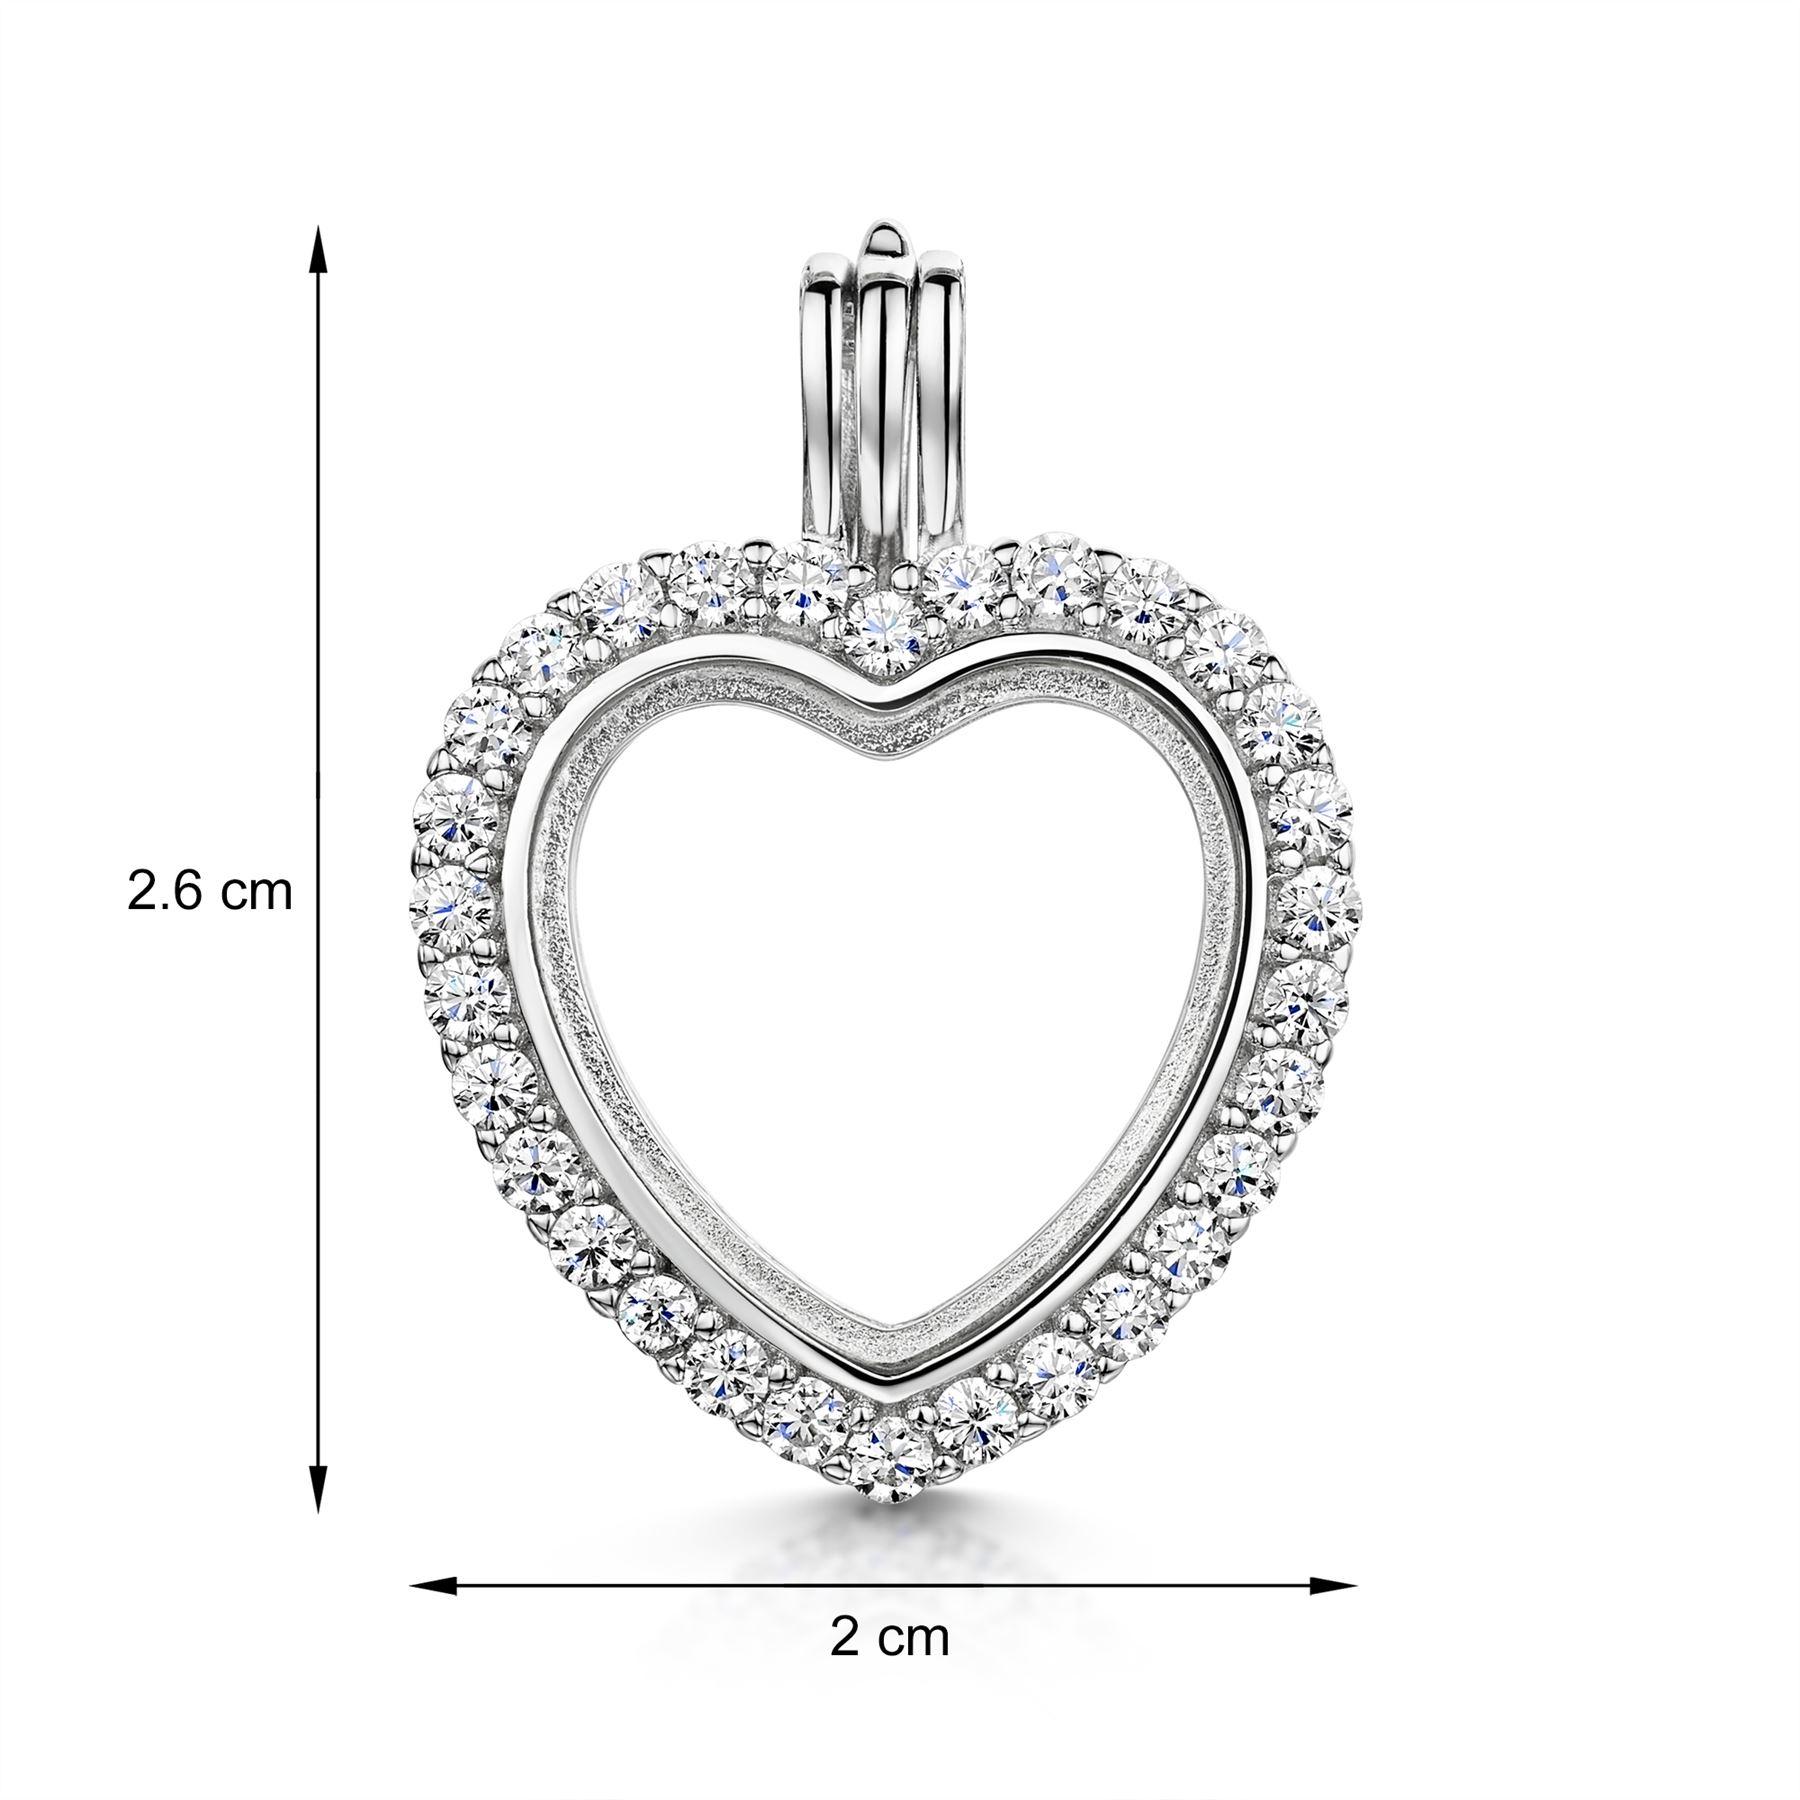 Amberta-Medallon-en-Fina-Plata-De-Ley-925-en-Formas-Diferentes-Para-Foto-y-Gemas miniatura 6